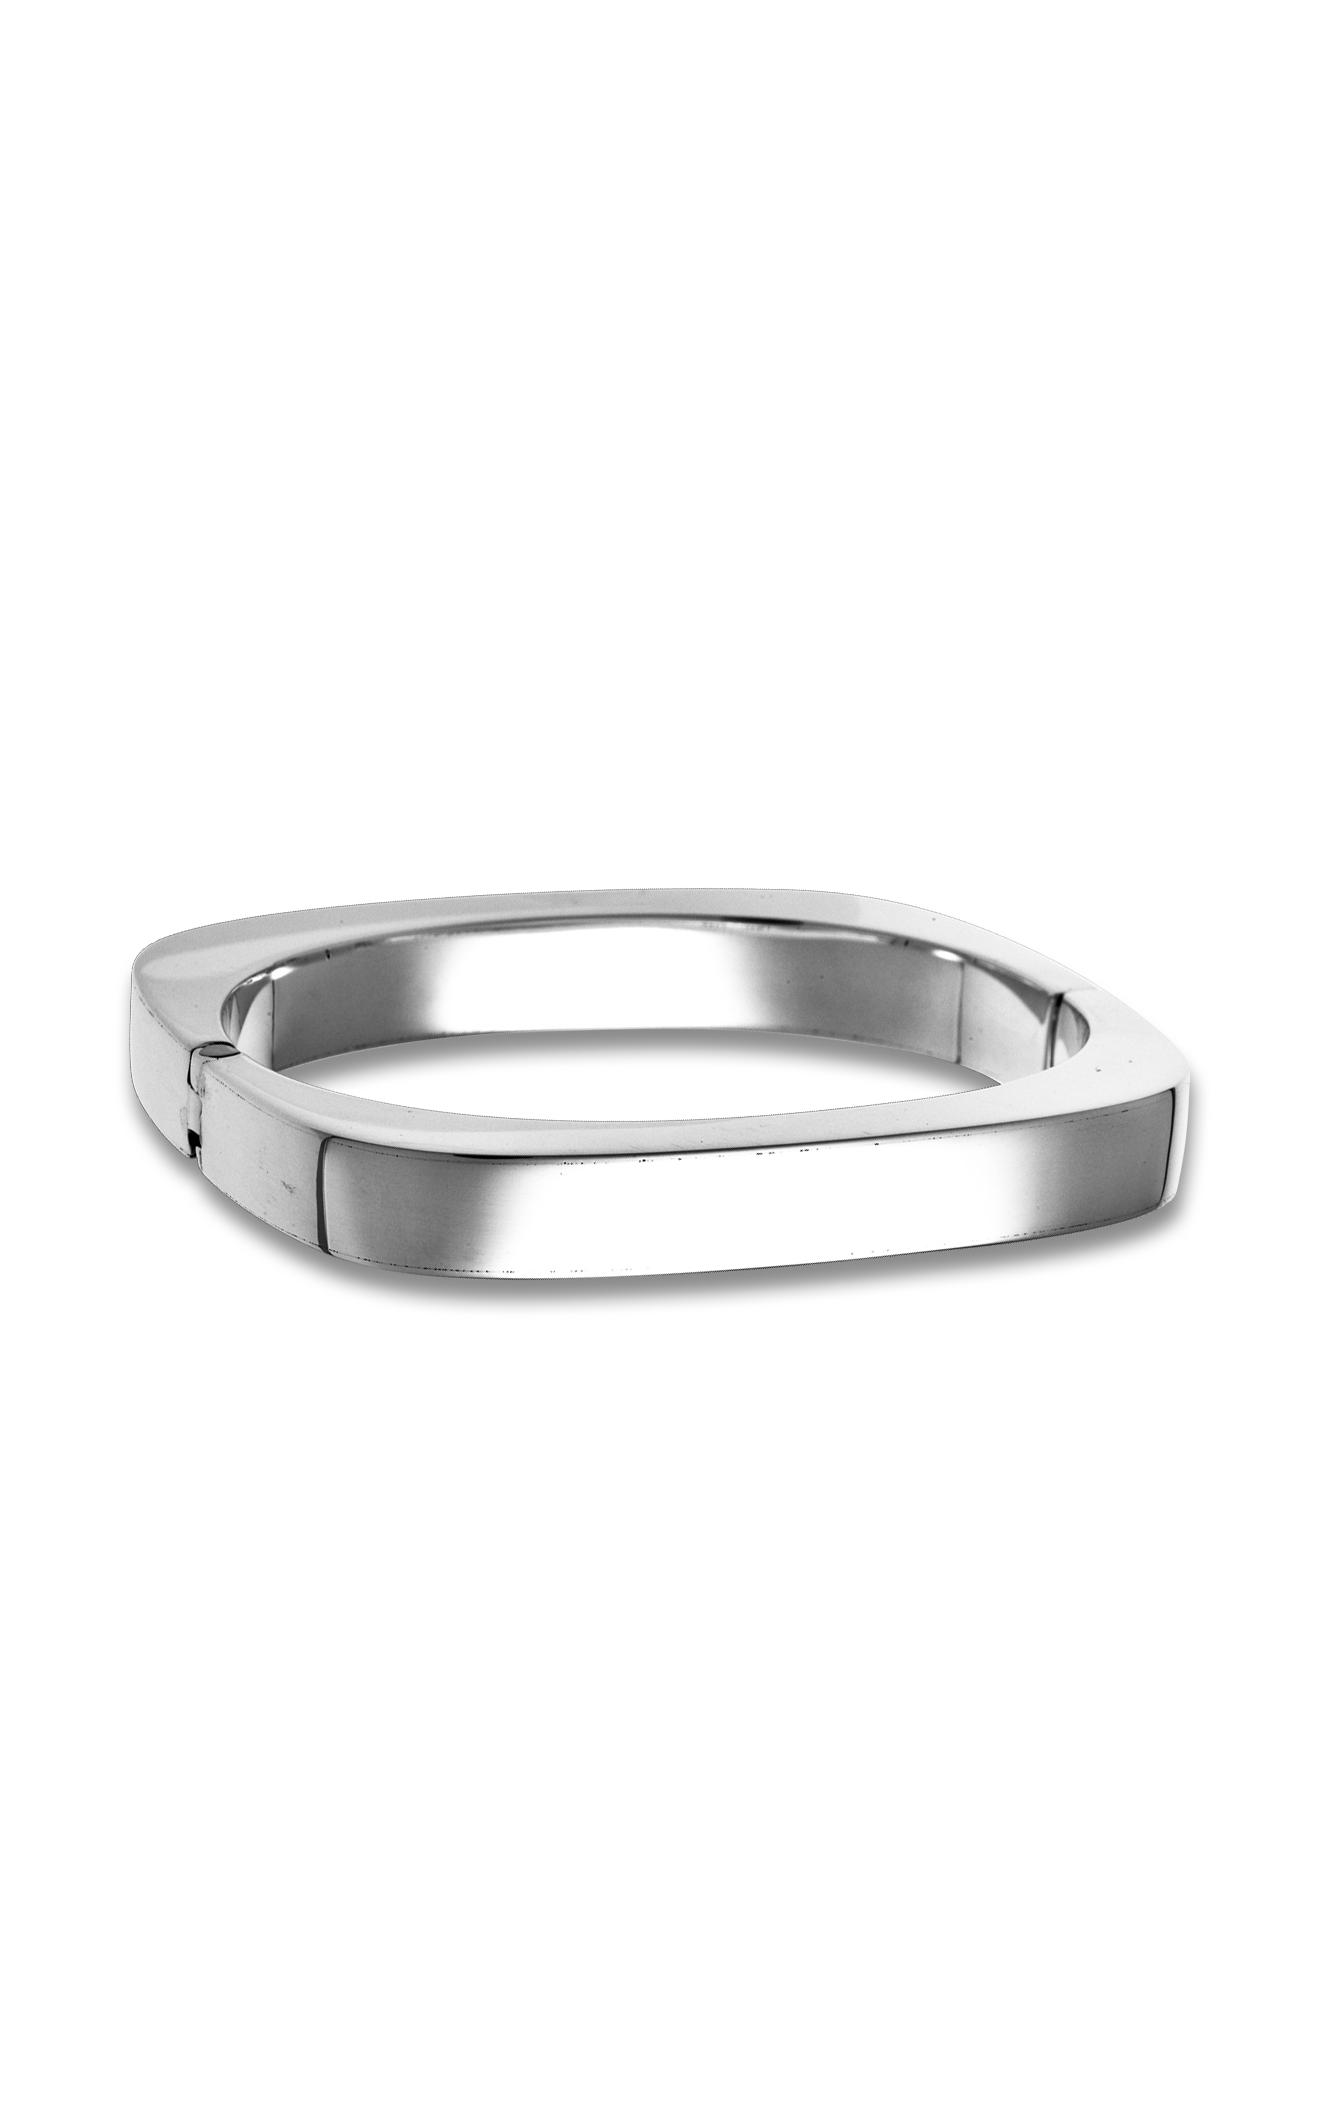 Zina Classic Bracelet A65 product image